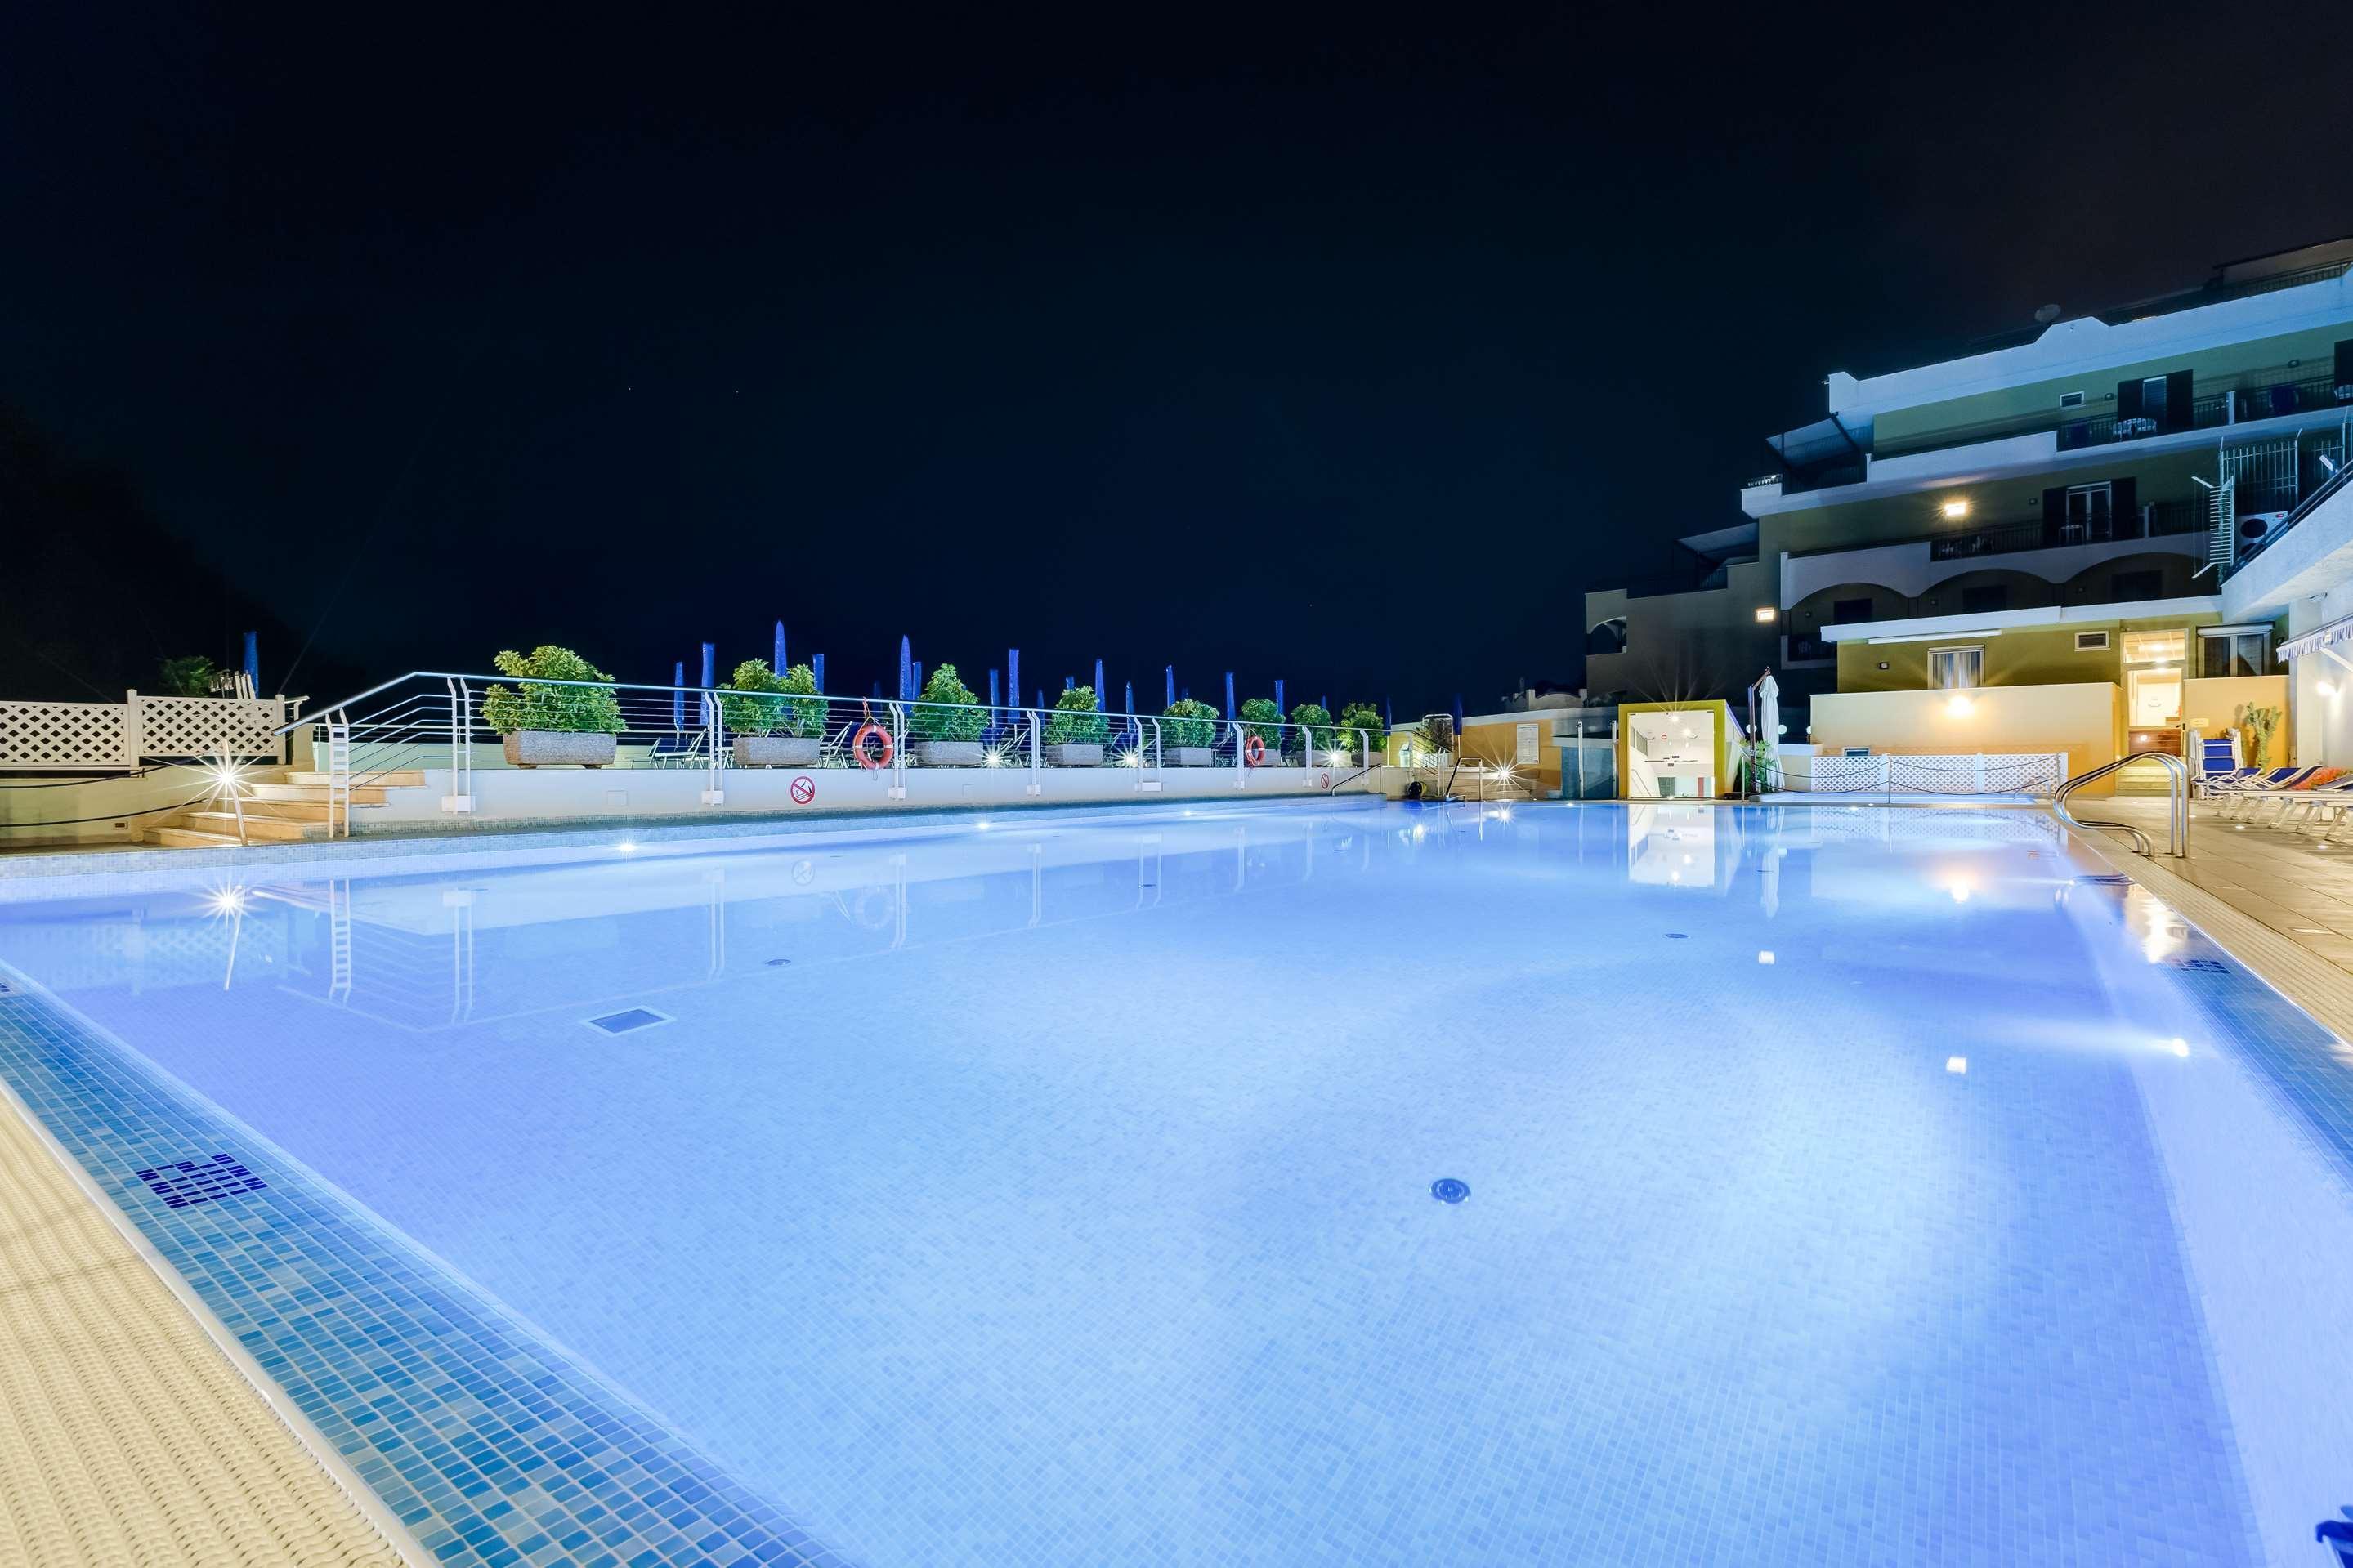 Best Western Hotel La Solara Sorrento Napoli Italy Compare Deals